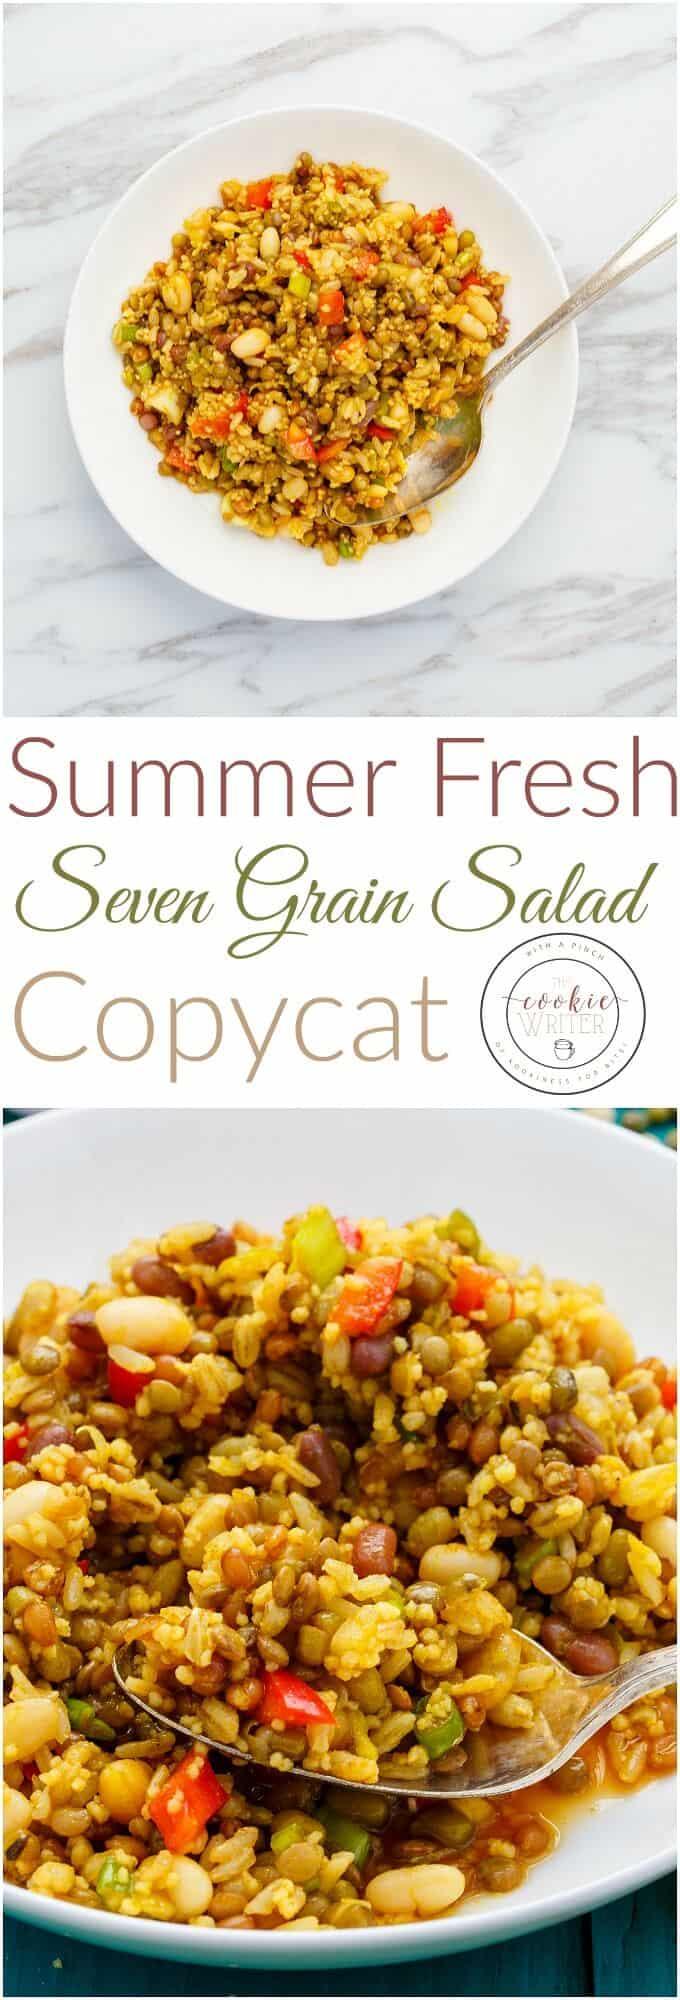 Summer Fresh Seven Grain Salad Copycat